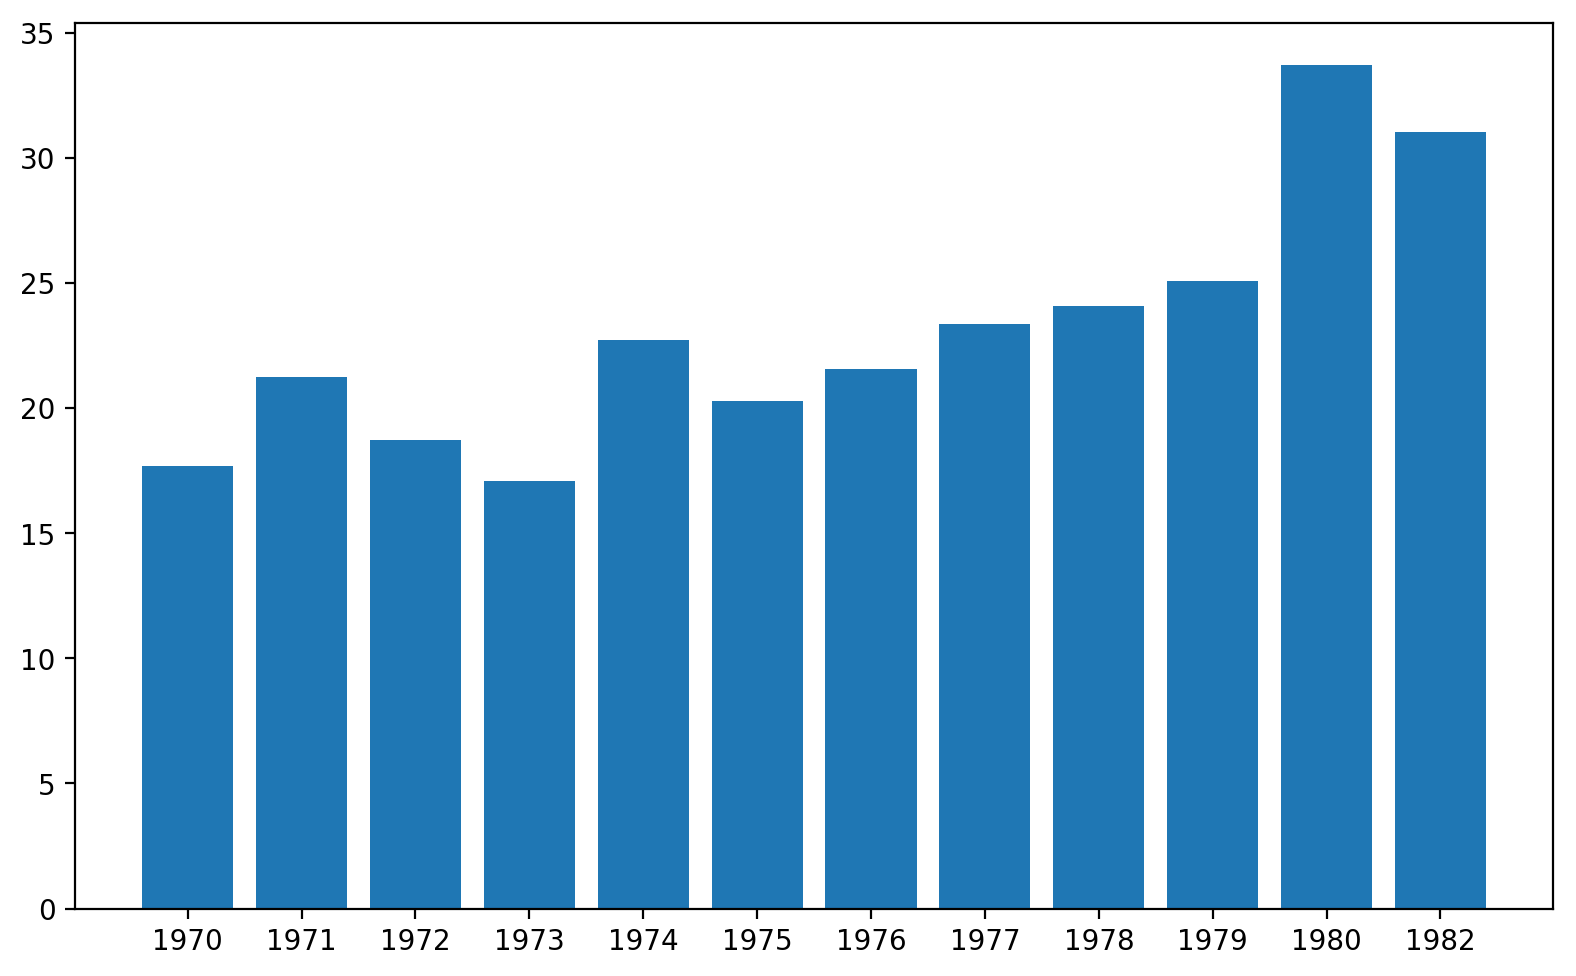 Python Charts - Beautiful Bar Charts in Matplotlib